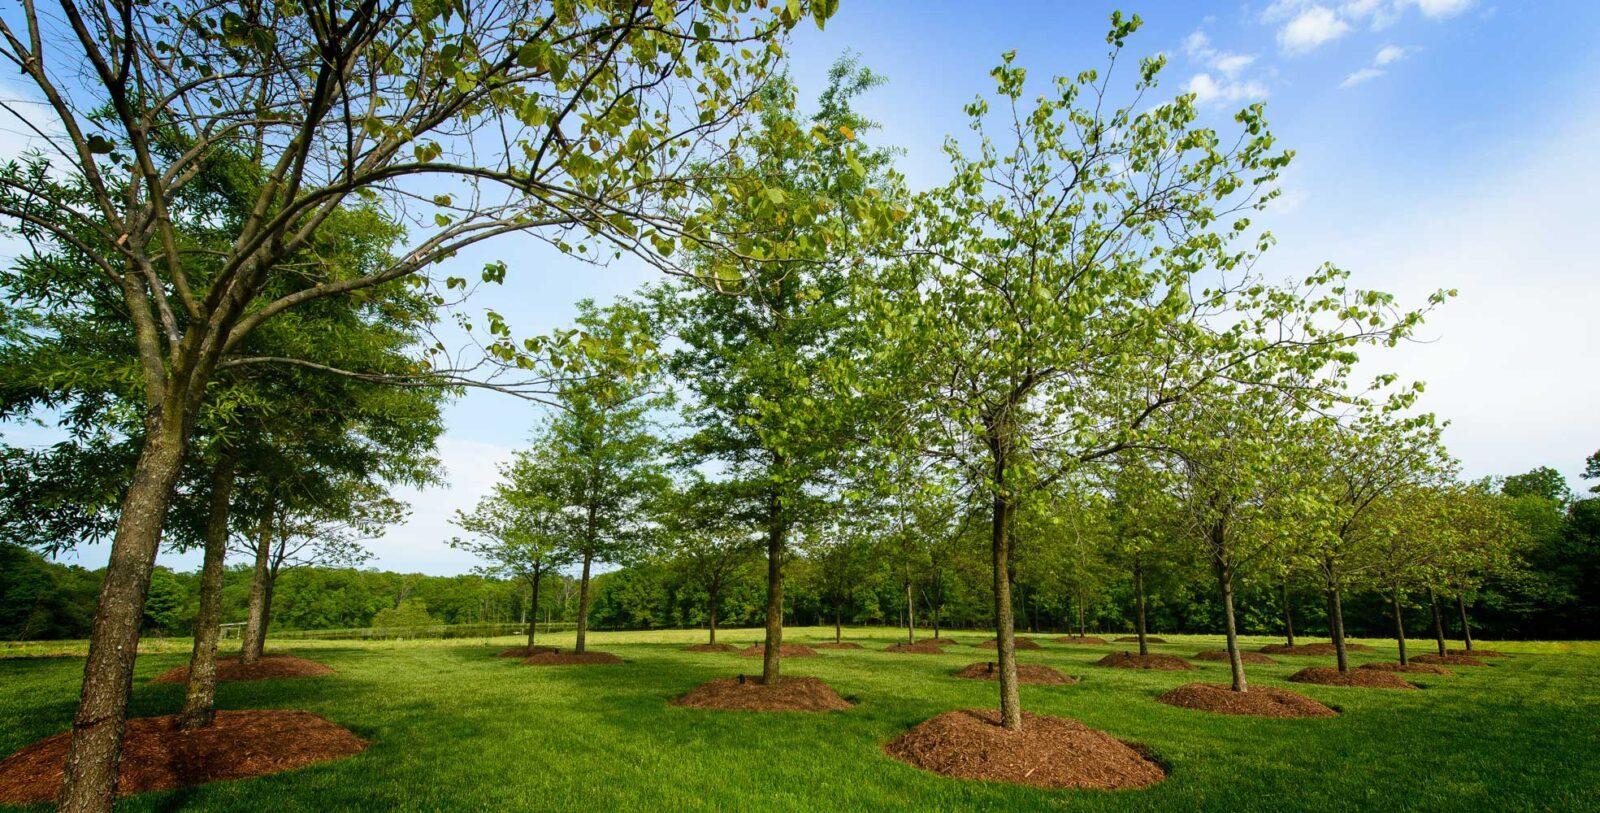 Arbor Day - Plant a Tree!